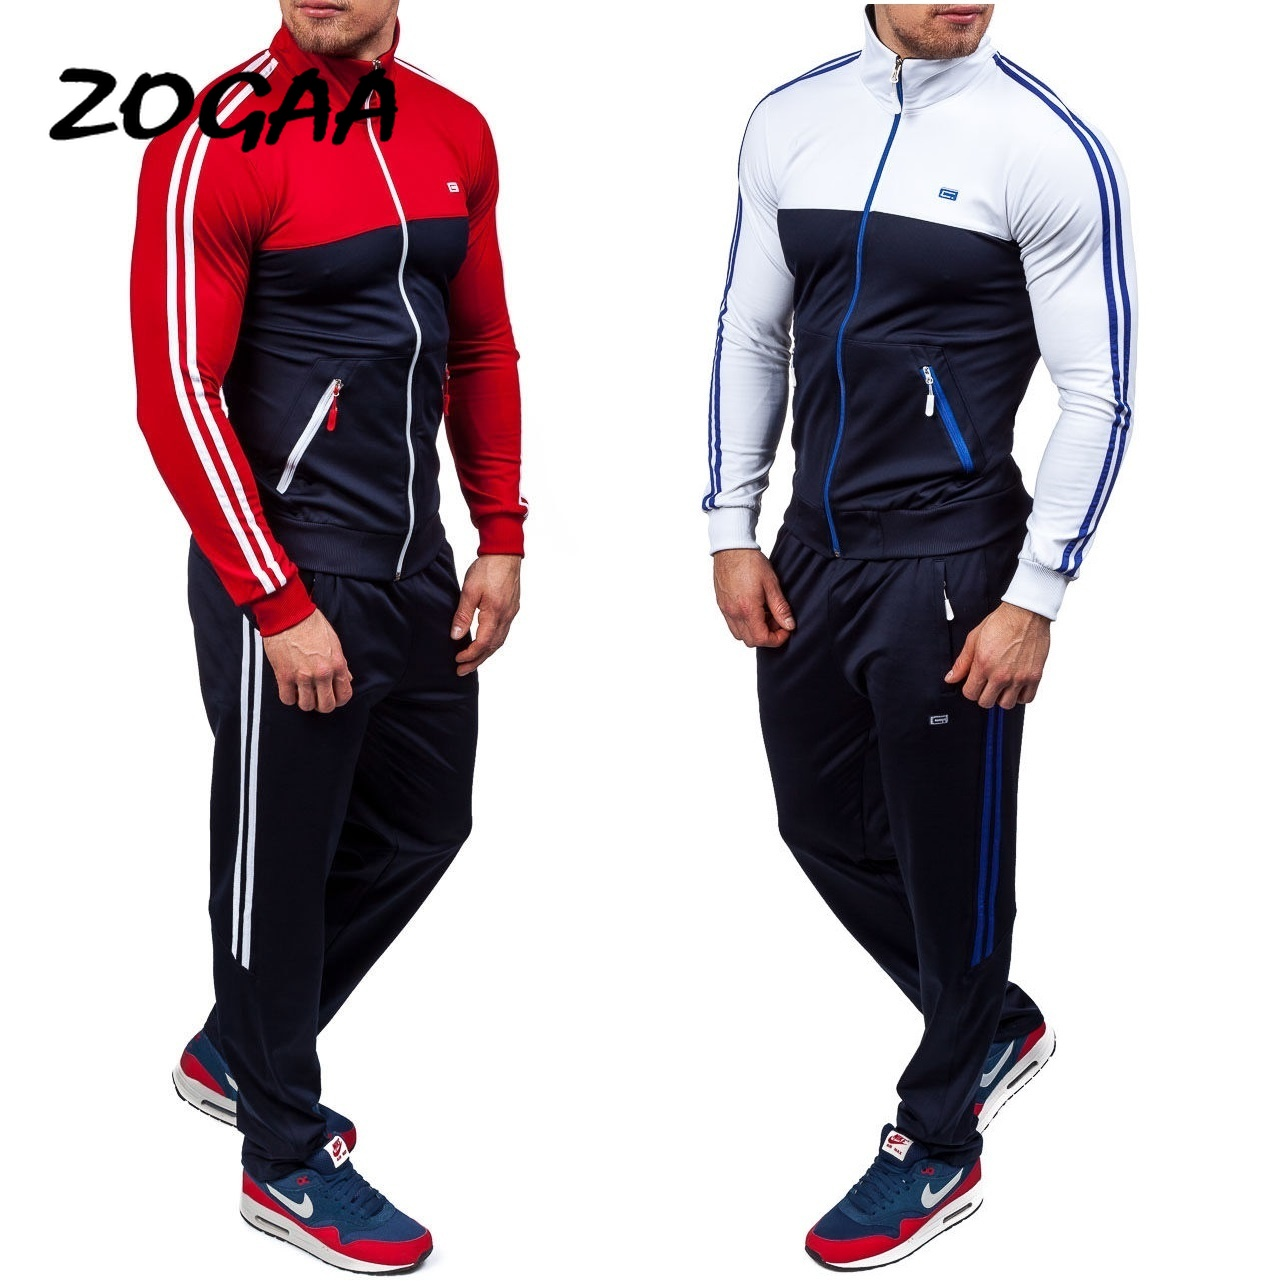 ZOGAA Autumn Men Casual Patchwork Sport Set Long Sleeve Jacket Trousers Men Sport Suit Fitness Wear Double Pocket Jogging Suits